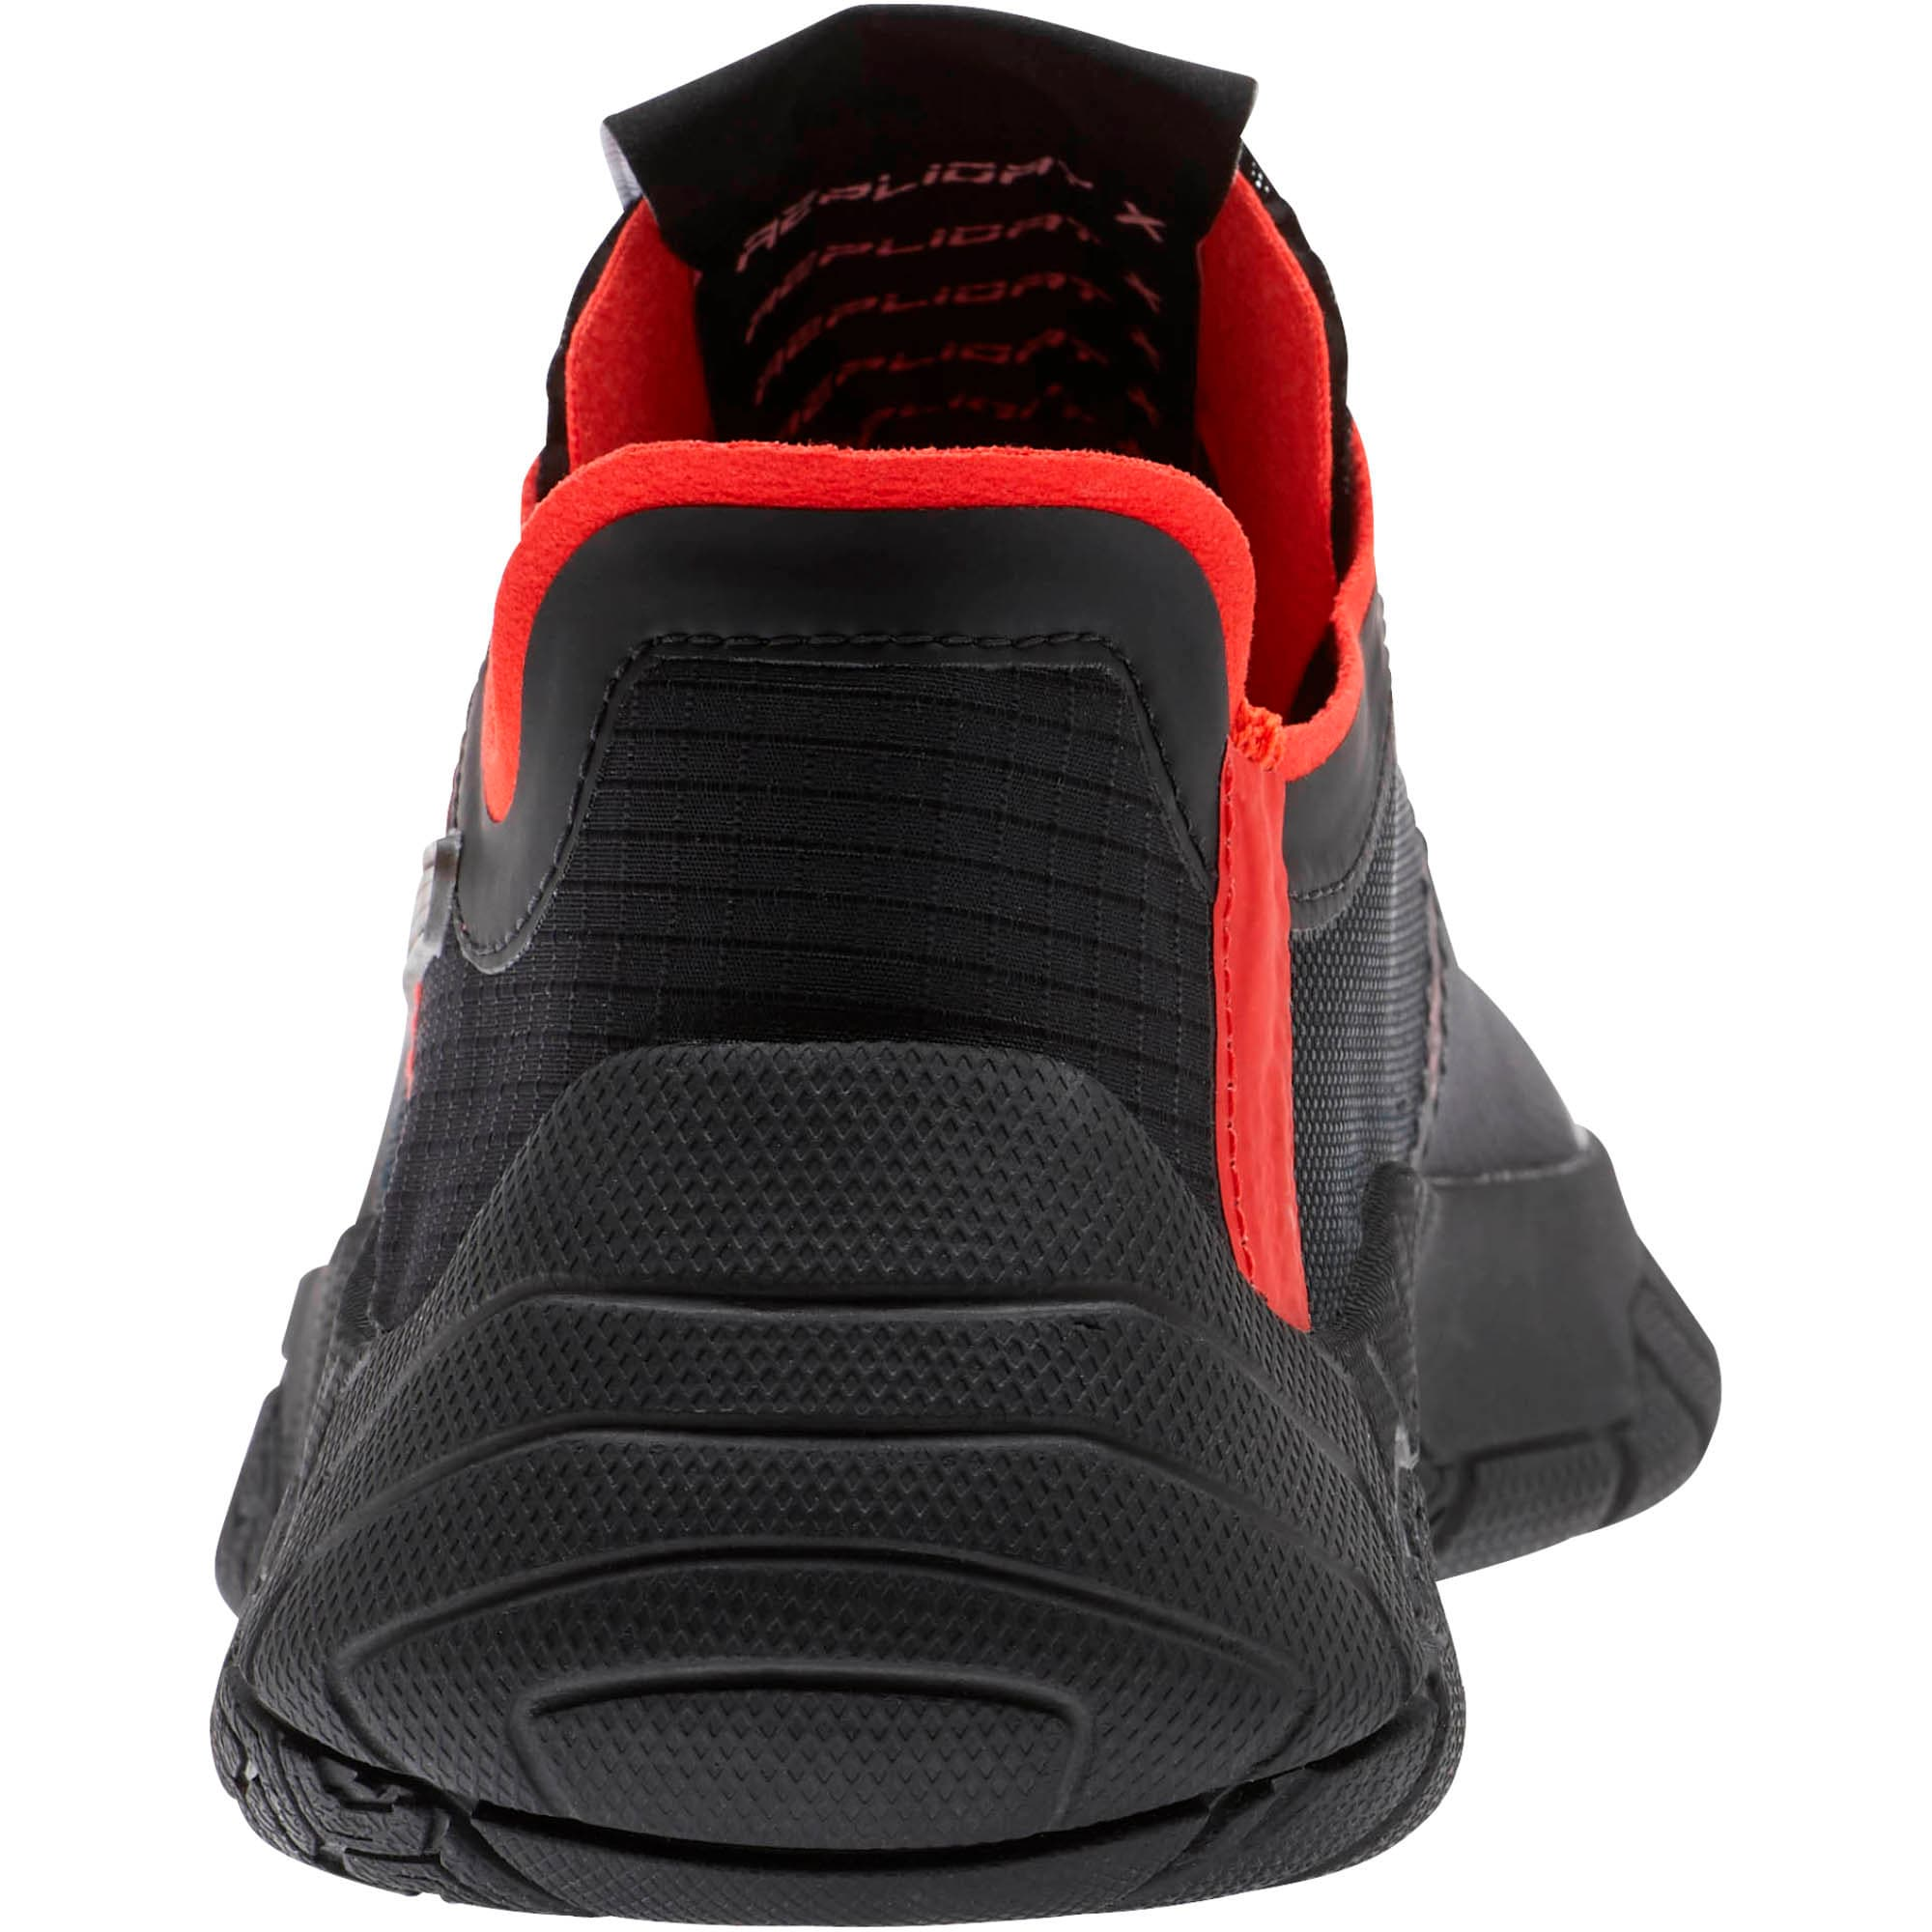 Thumbnail 3 of Replicat-X Circuit Motorsport Shoes, Puma Black-Puma Red, medium